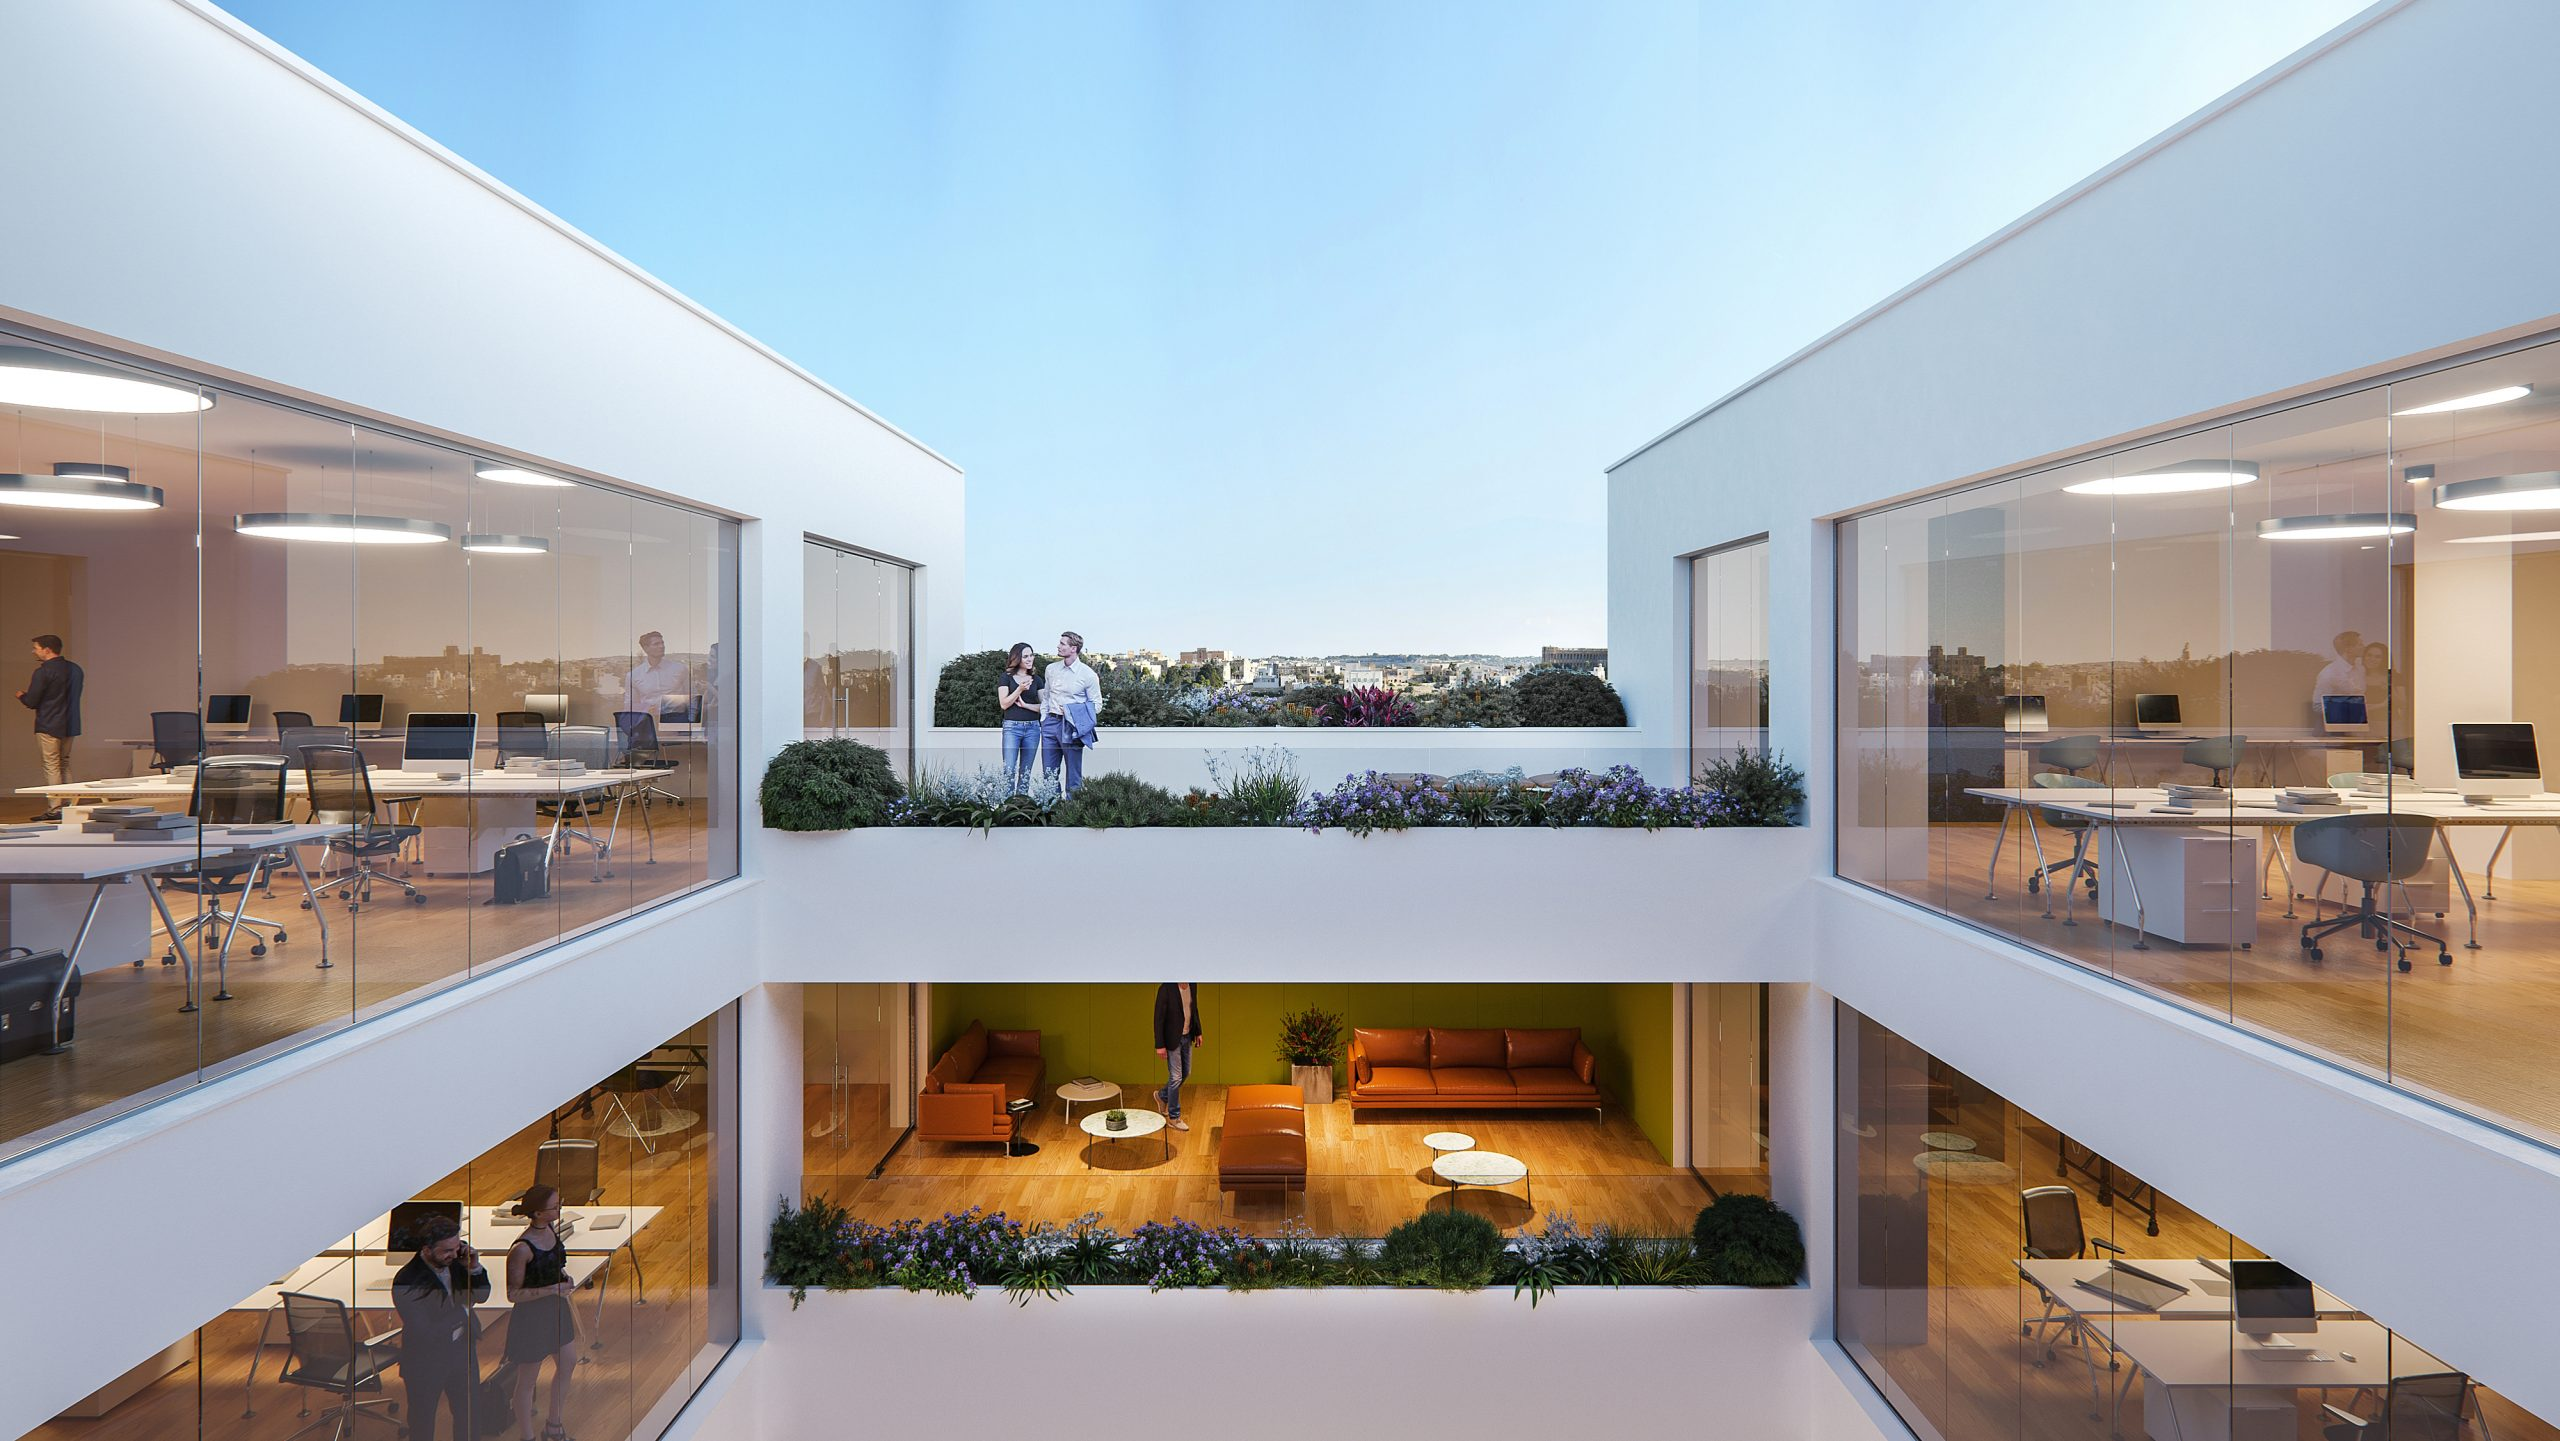 https://dprostudio.com/wp-content/uploads/2021/01/terrace-render-_-dprostudio-scaled.jpg